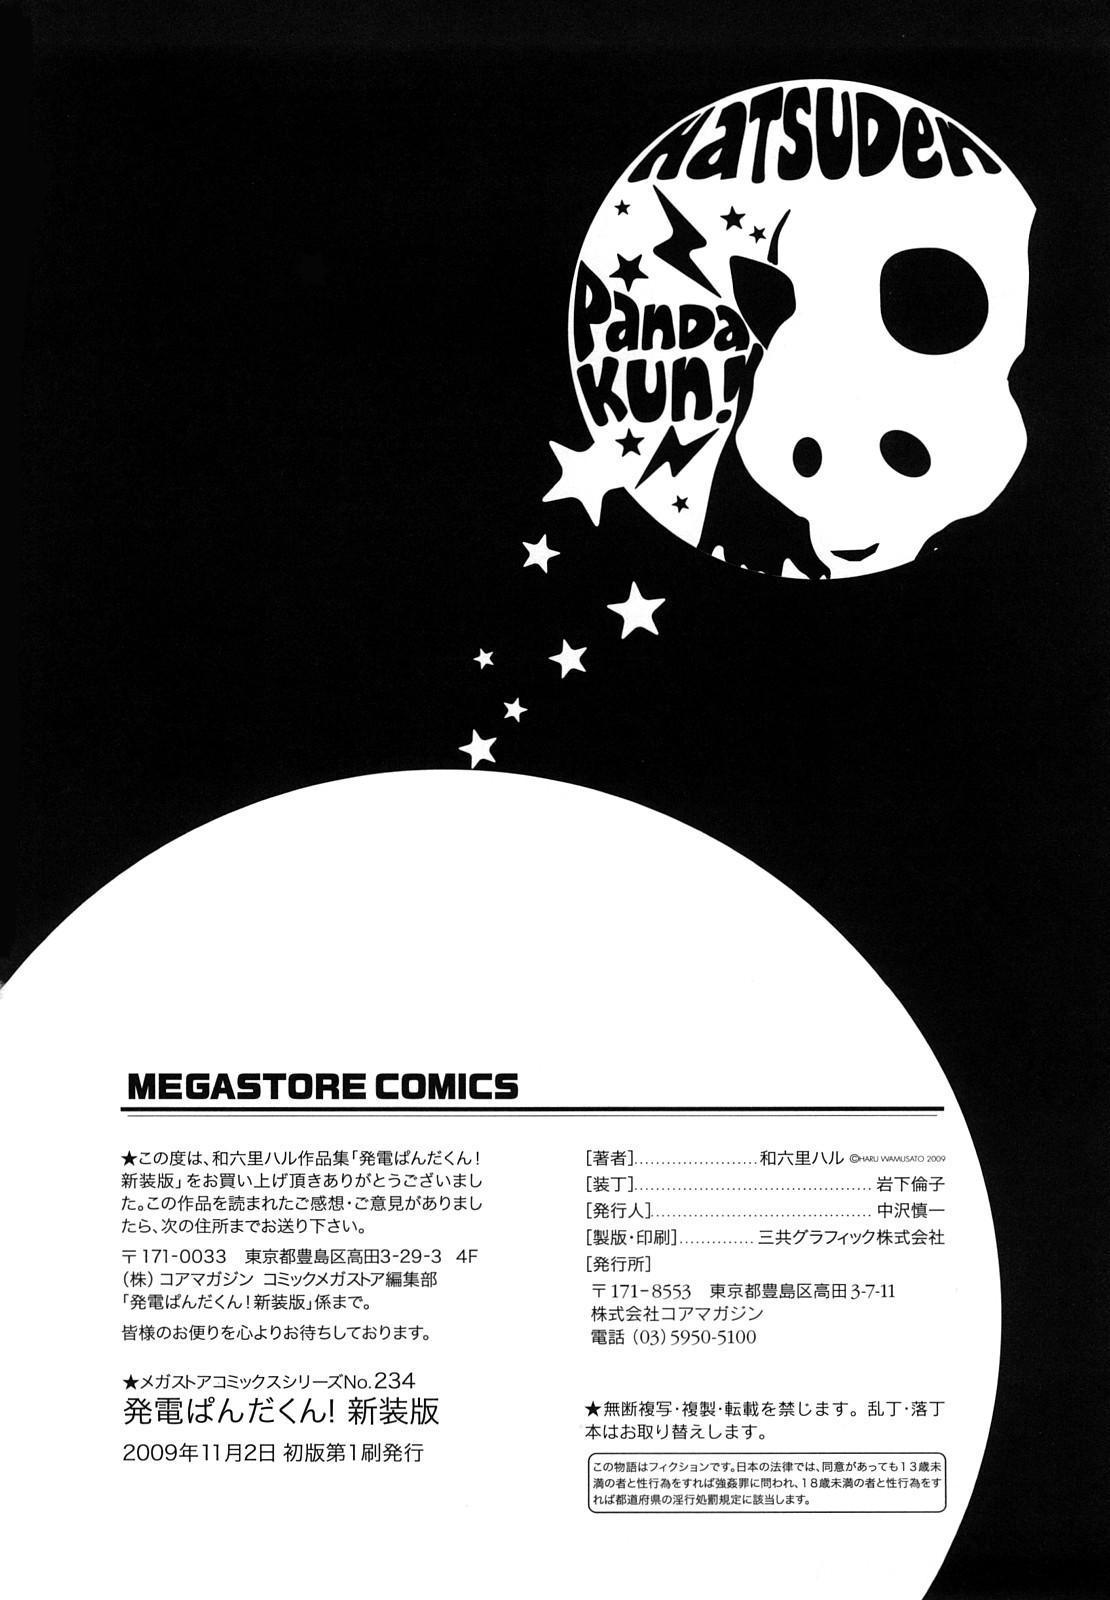 Hatsuden Pandakun! Shinsouban 220